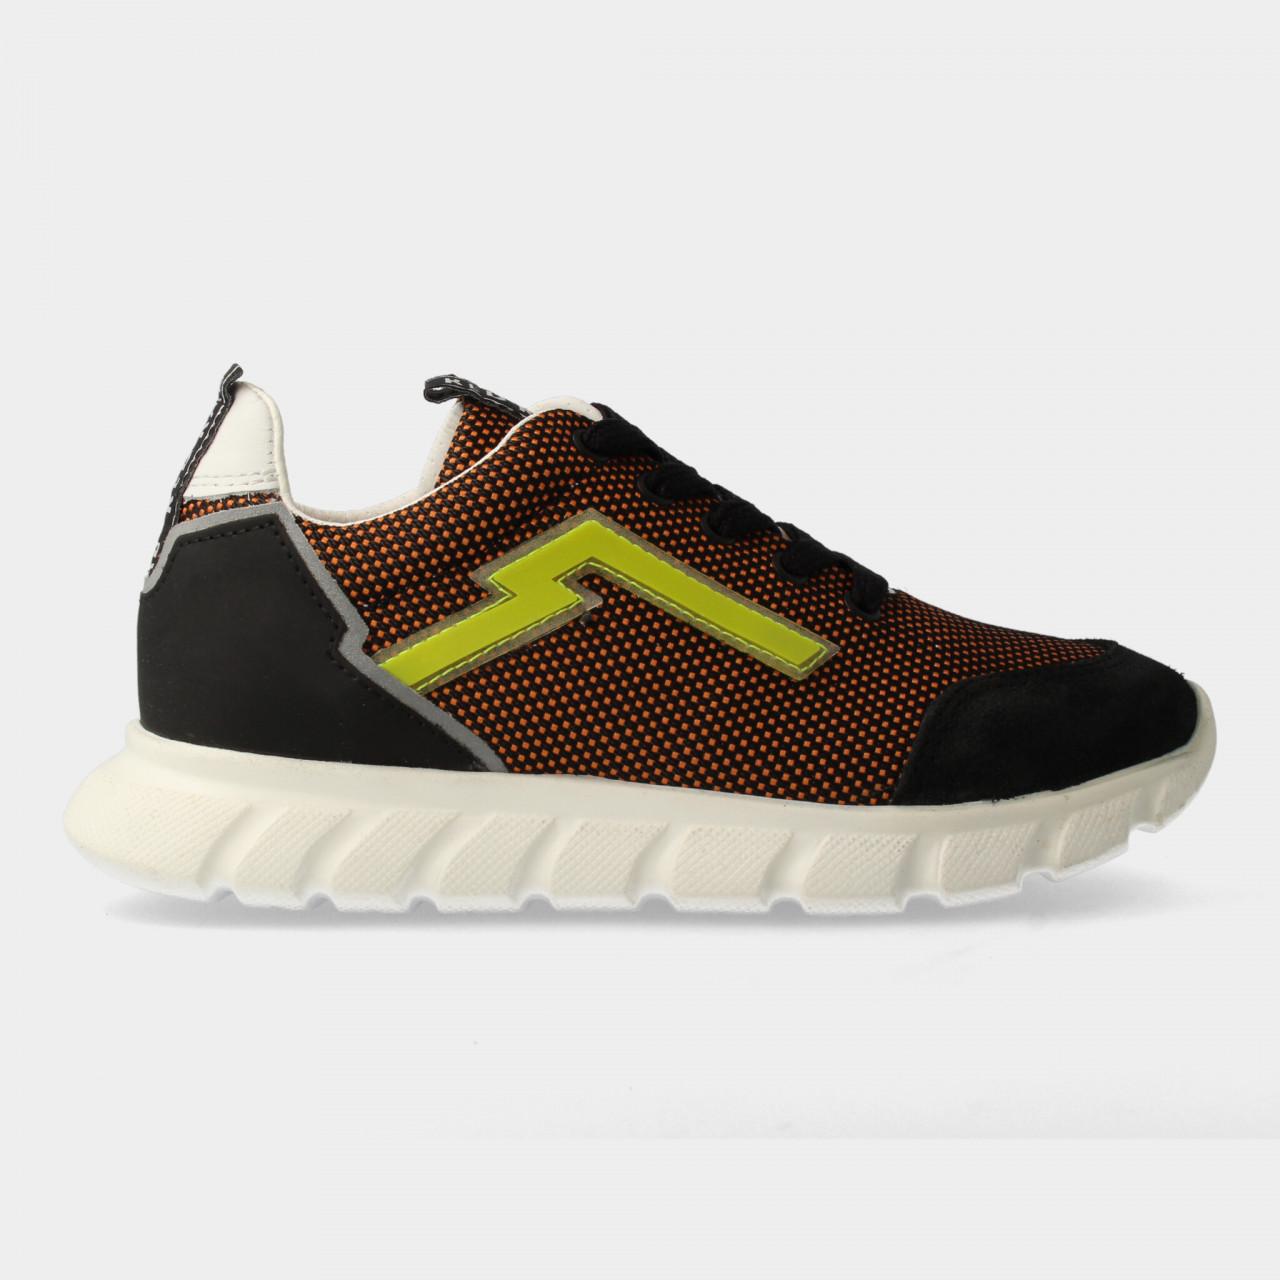 13443   Boys Low Cut Sneaker Laces